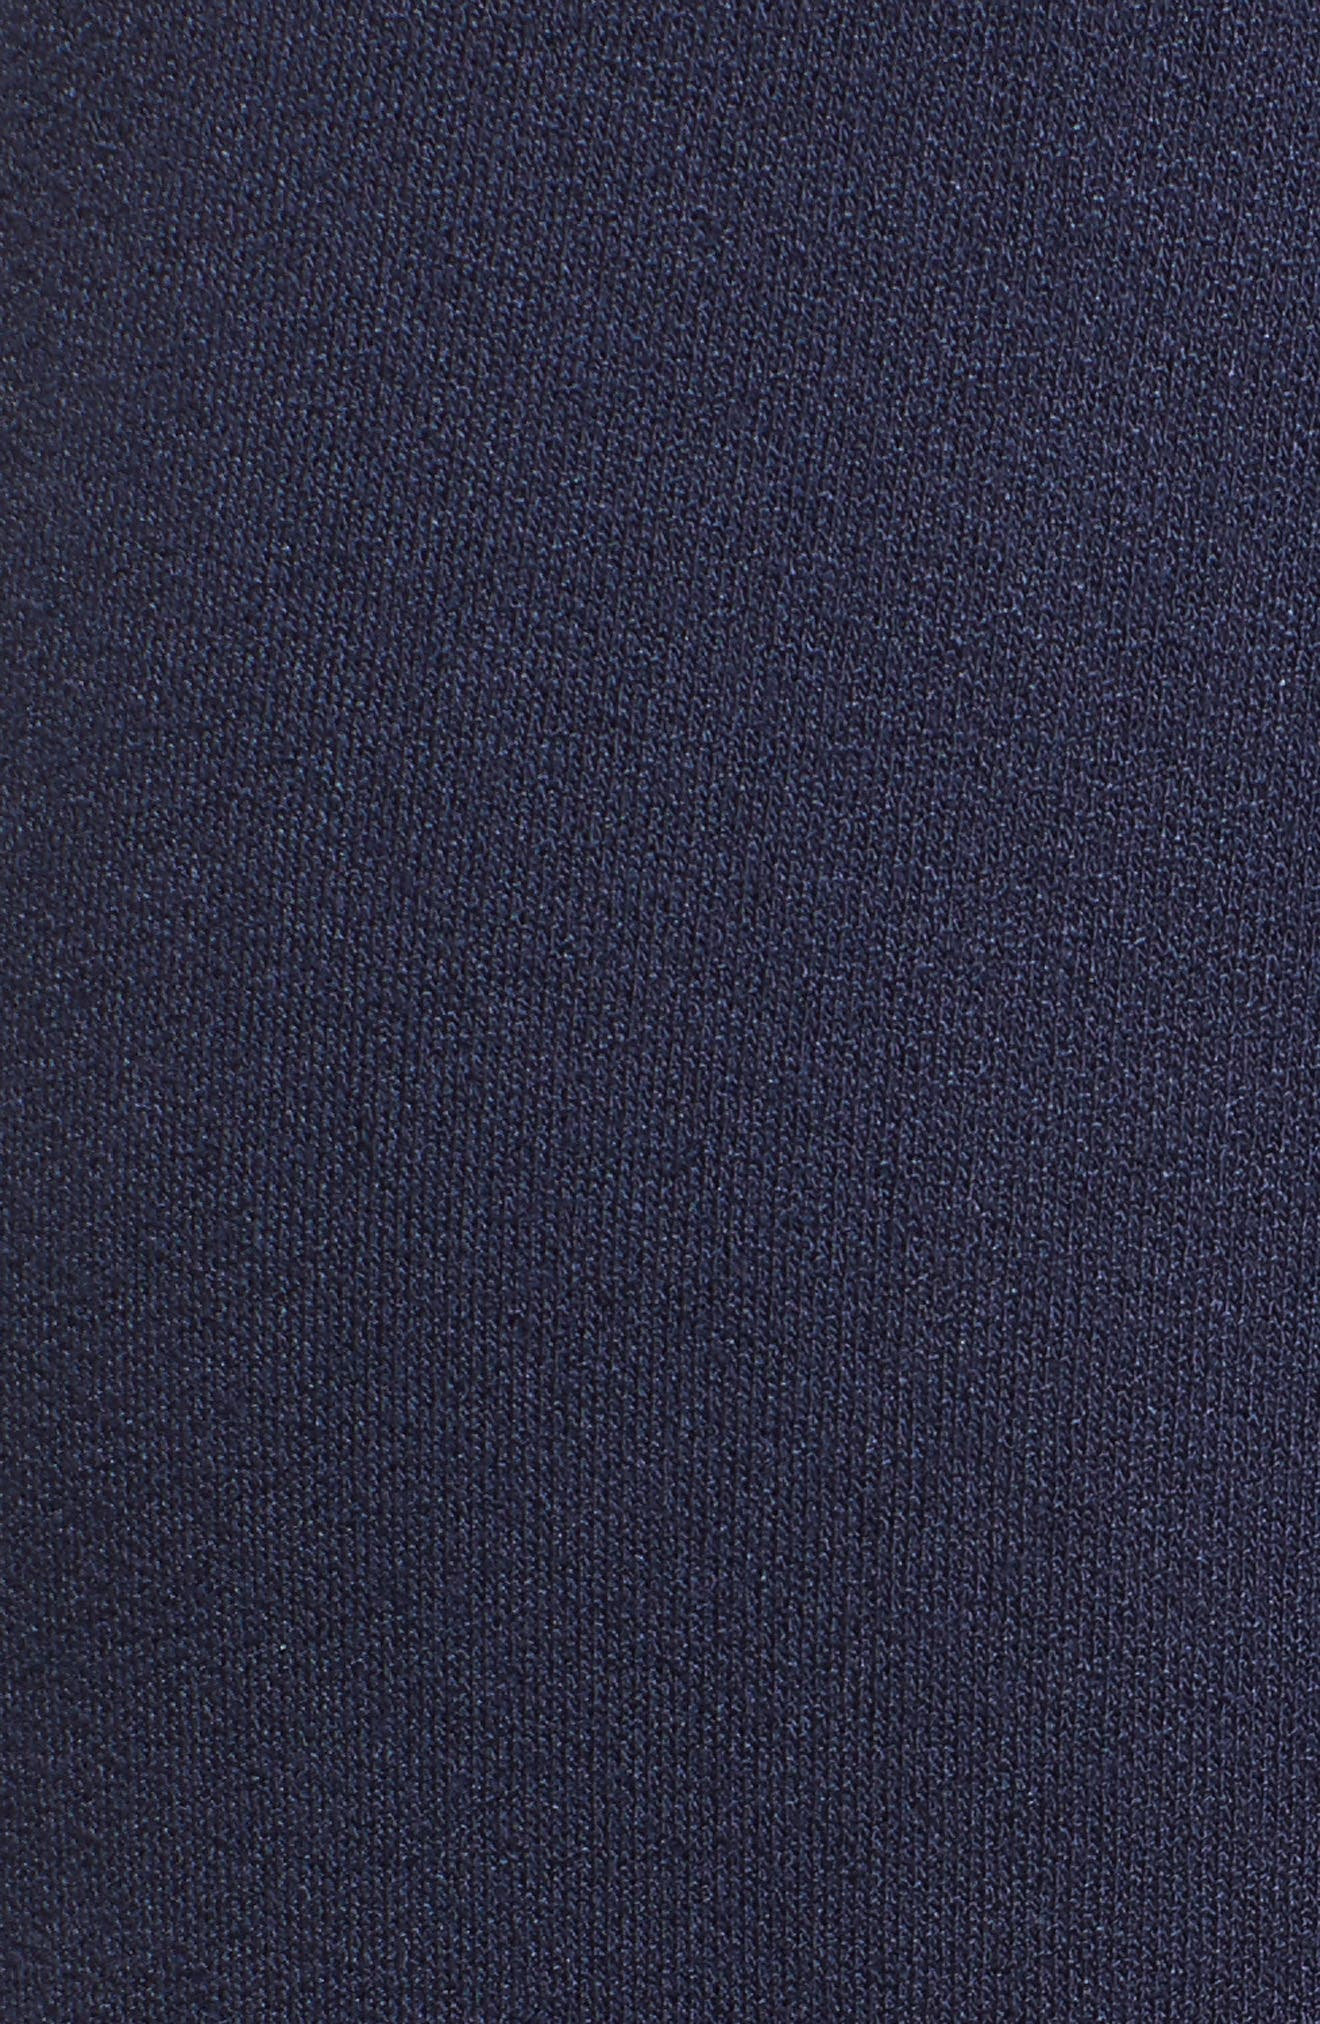 Knit Tulip Hem Pants,                             Alternate thumbnail 5, color,                             Navy Peacoat